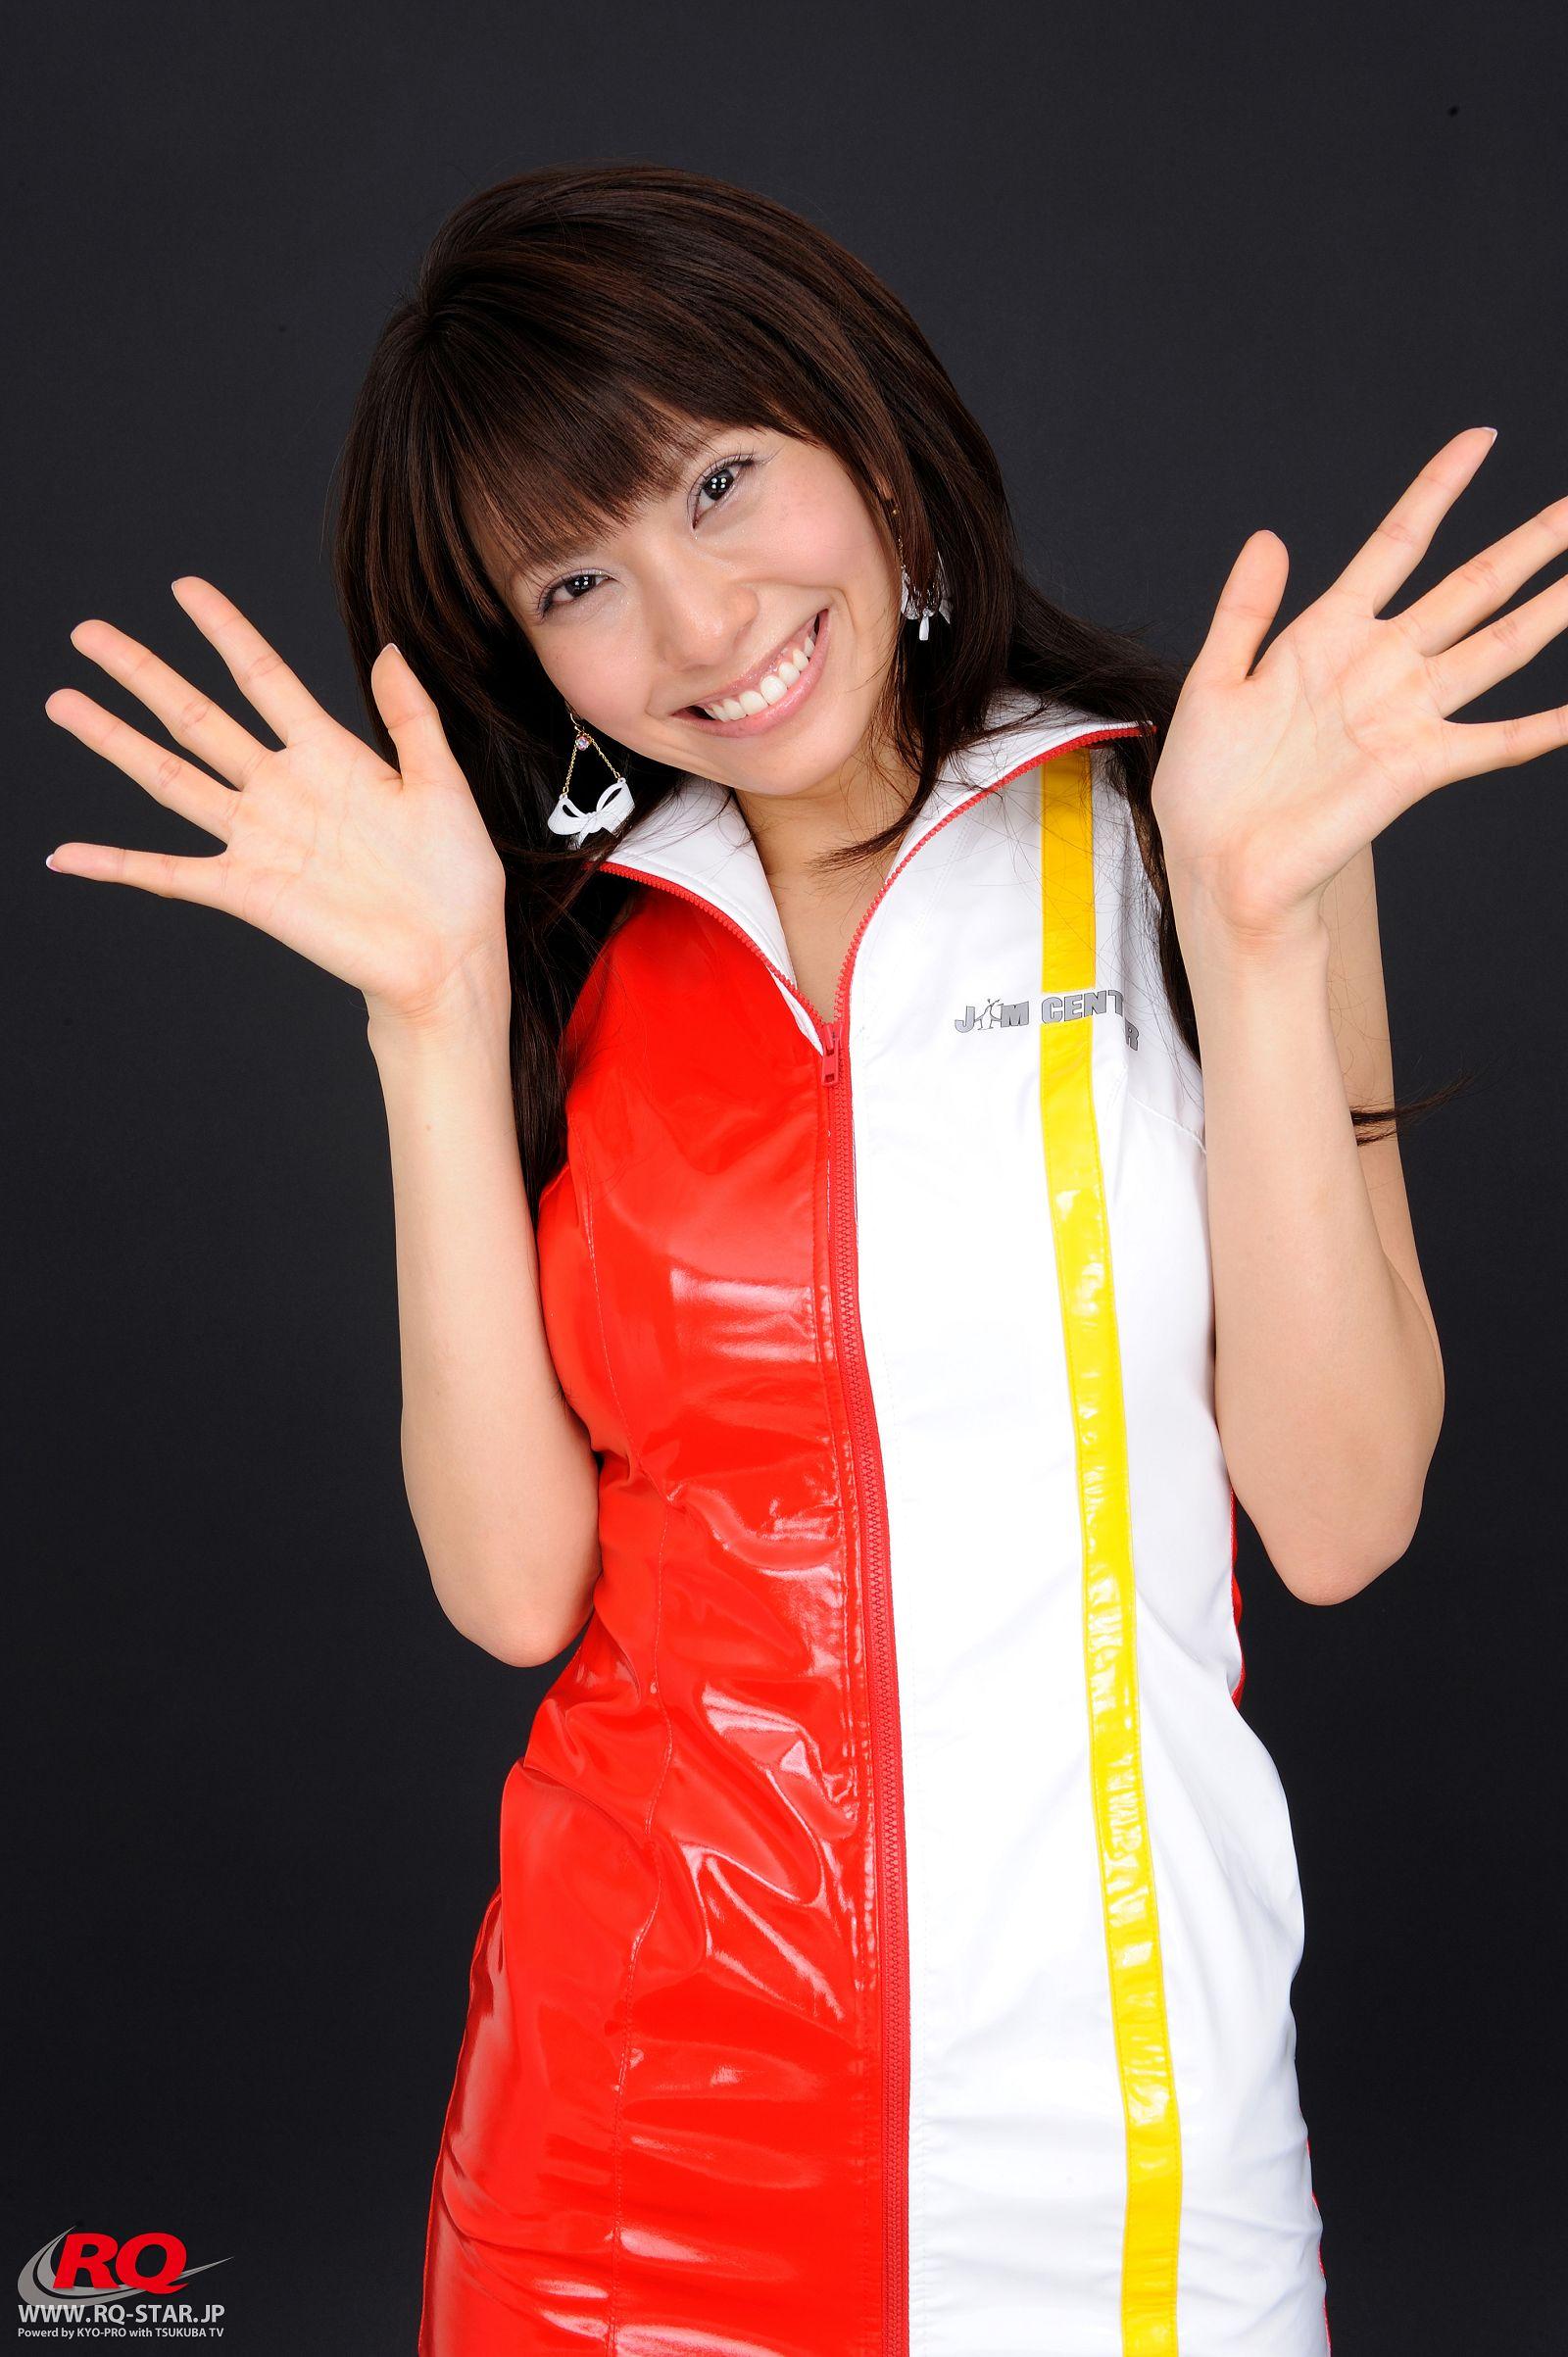 [RQ STAR美女] NO.0013 Asada Honoka 浅田ほのか[100P] RQ STAR 第3张